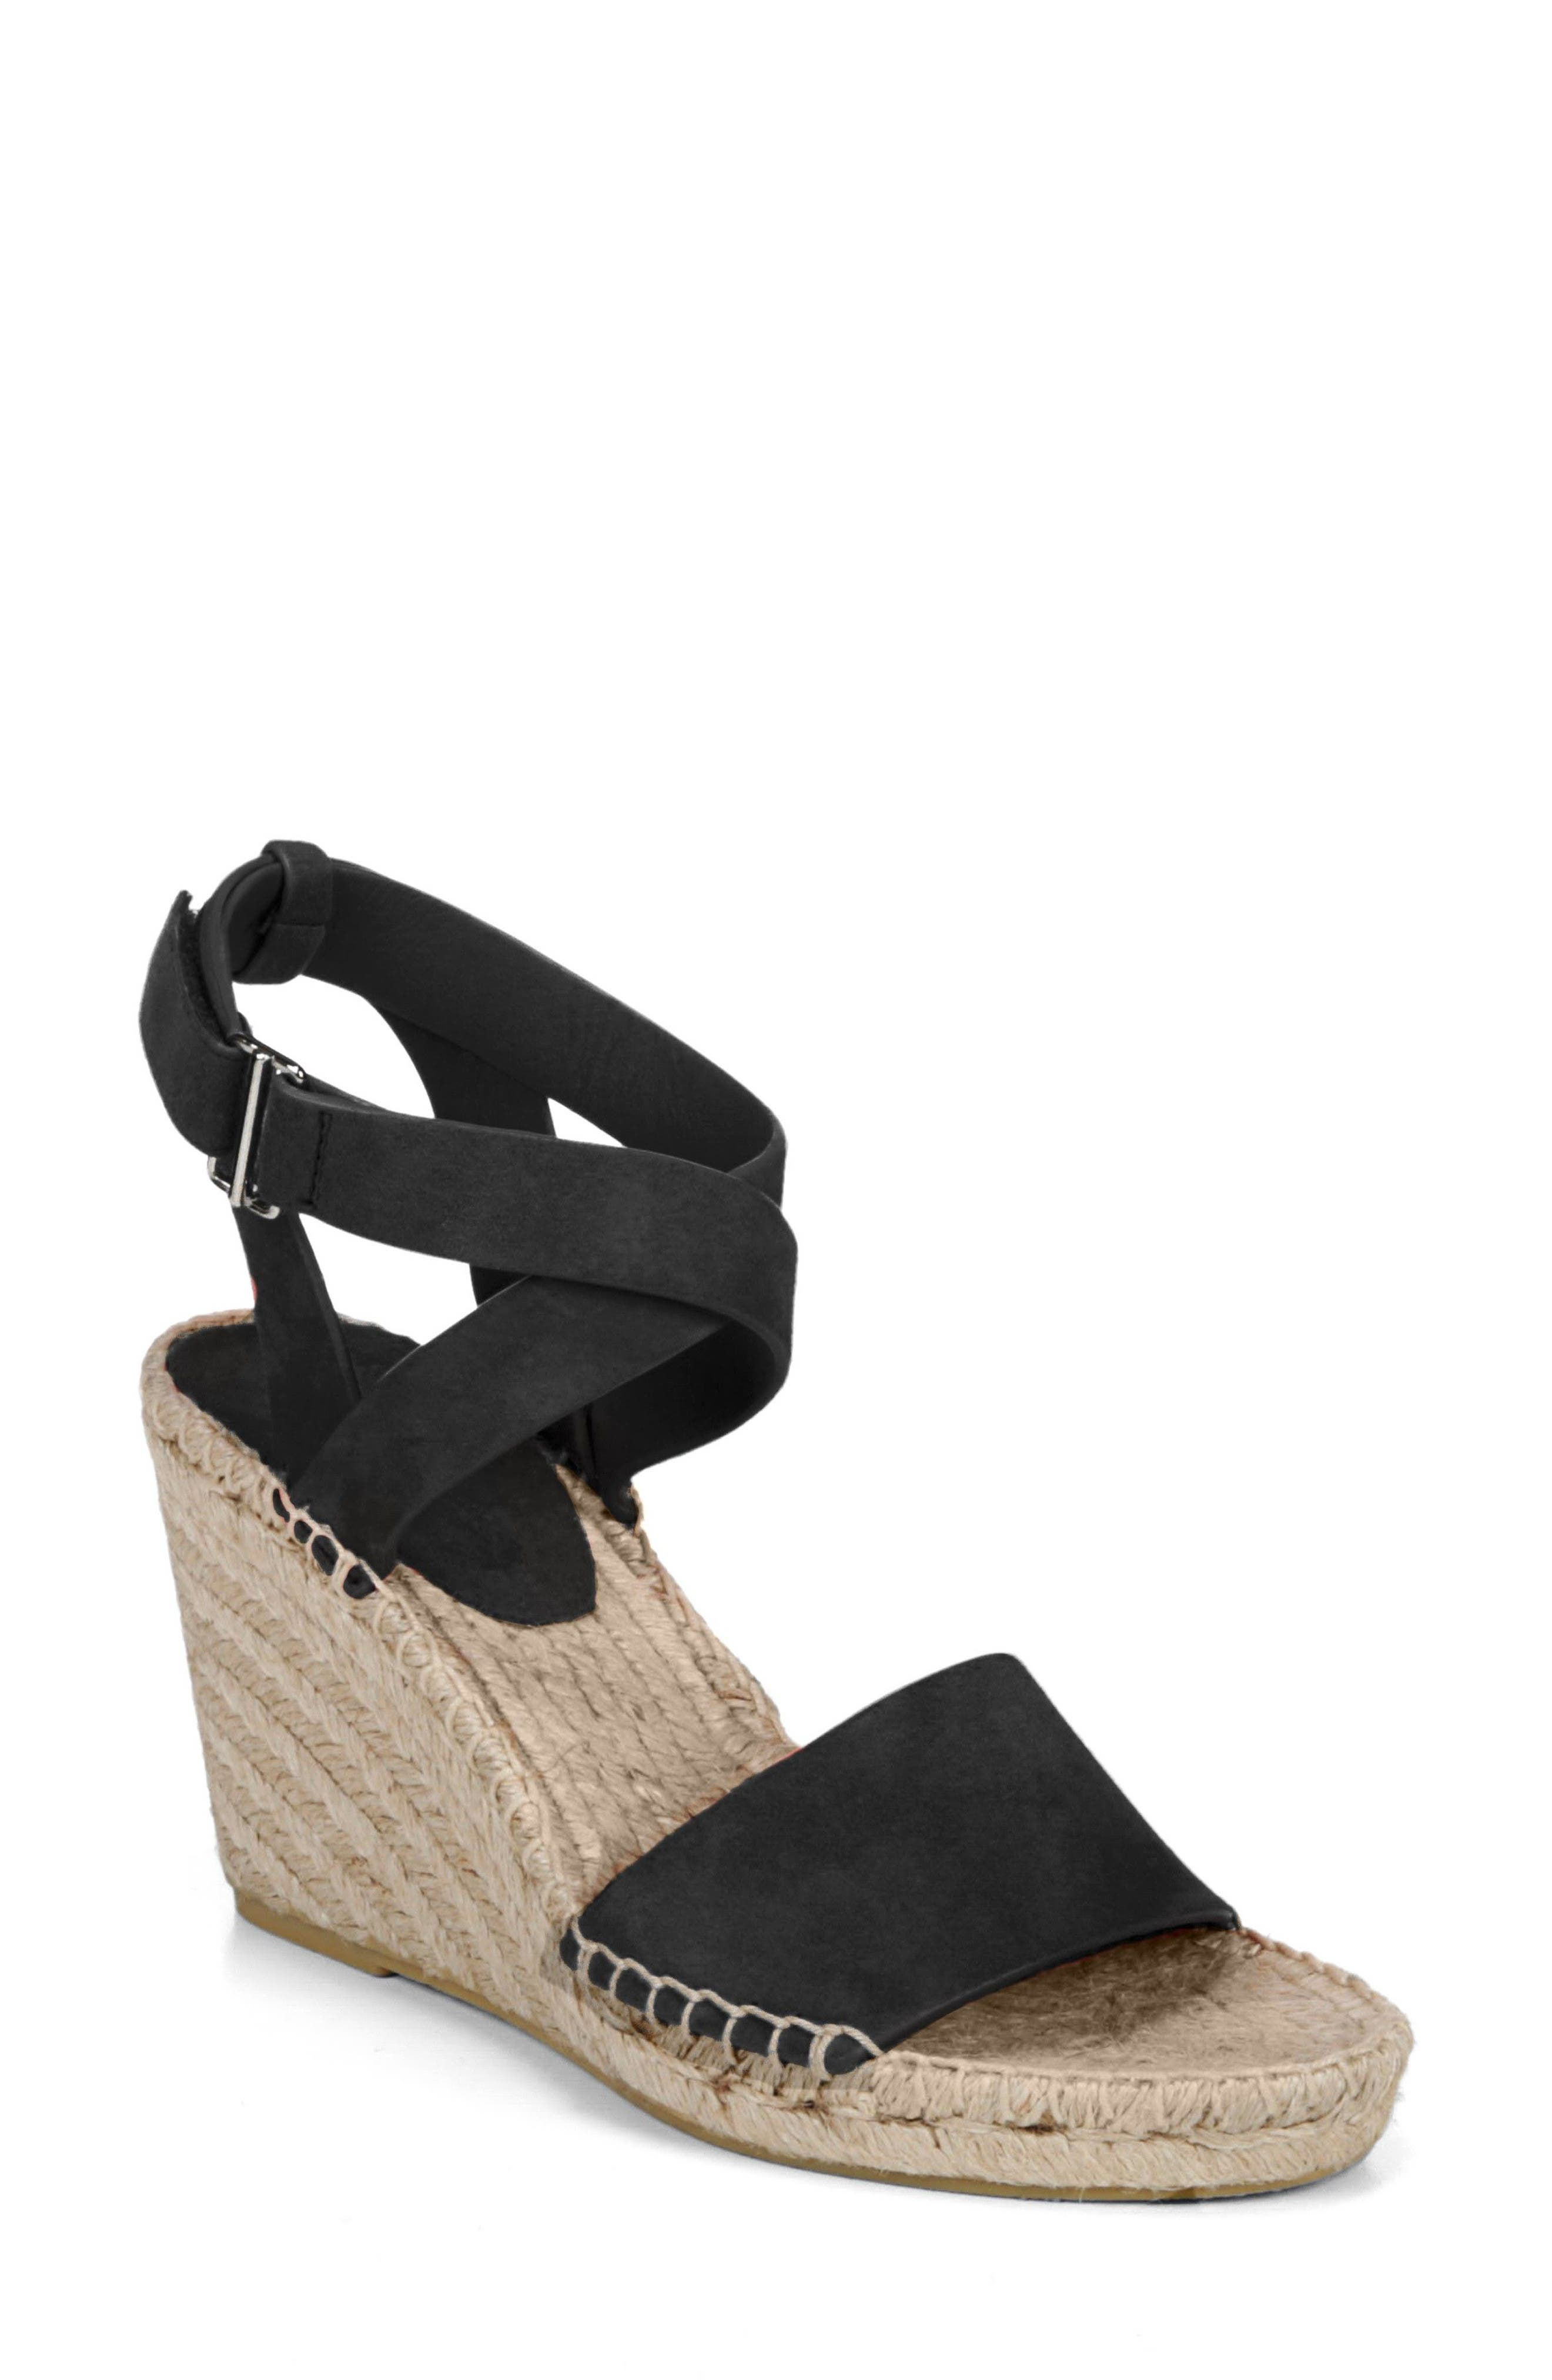 VIA SPIGA Nevada Espadrille Wedge Sandal, Main, color, 002